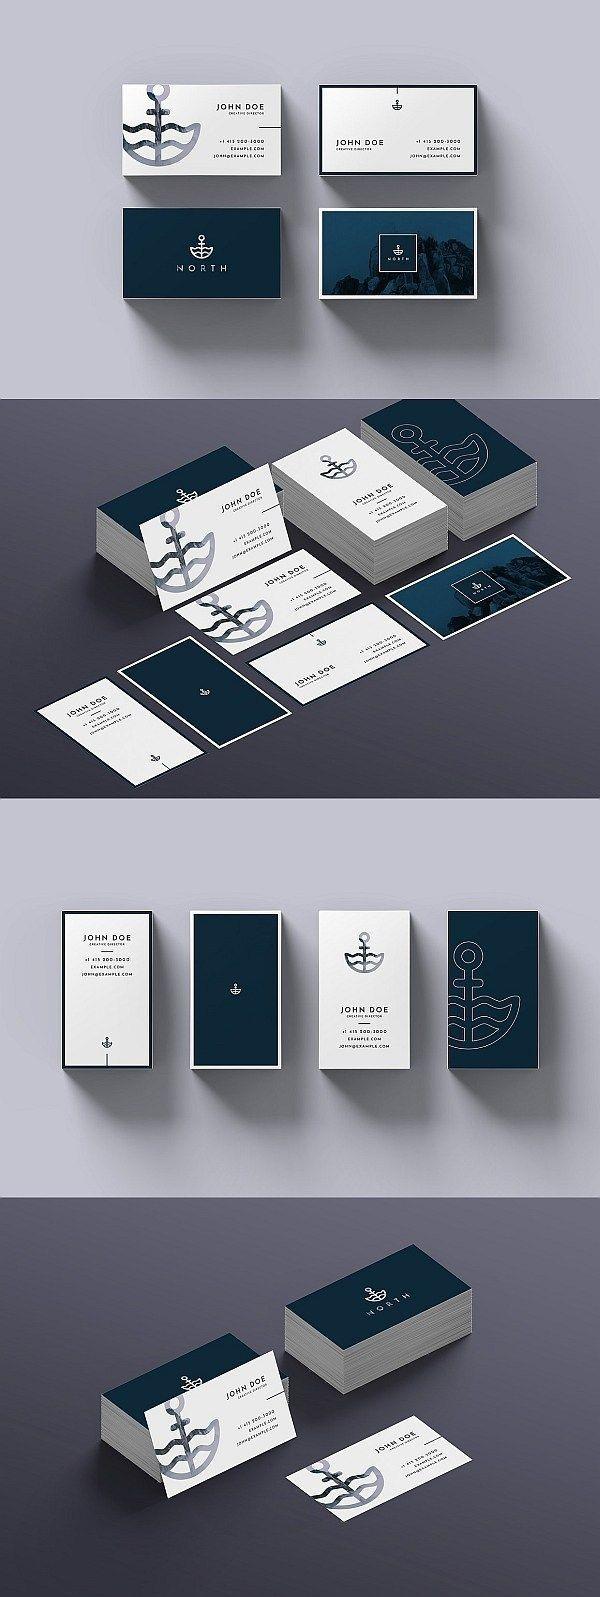 8 Business Card Templates Logo 12 Mockup Scenes Businesscard Design Template Visit In 2020 Sample Business Cards Standard Business Card Size Cool Business Cards